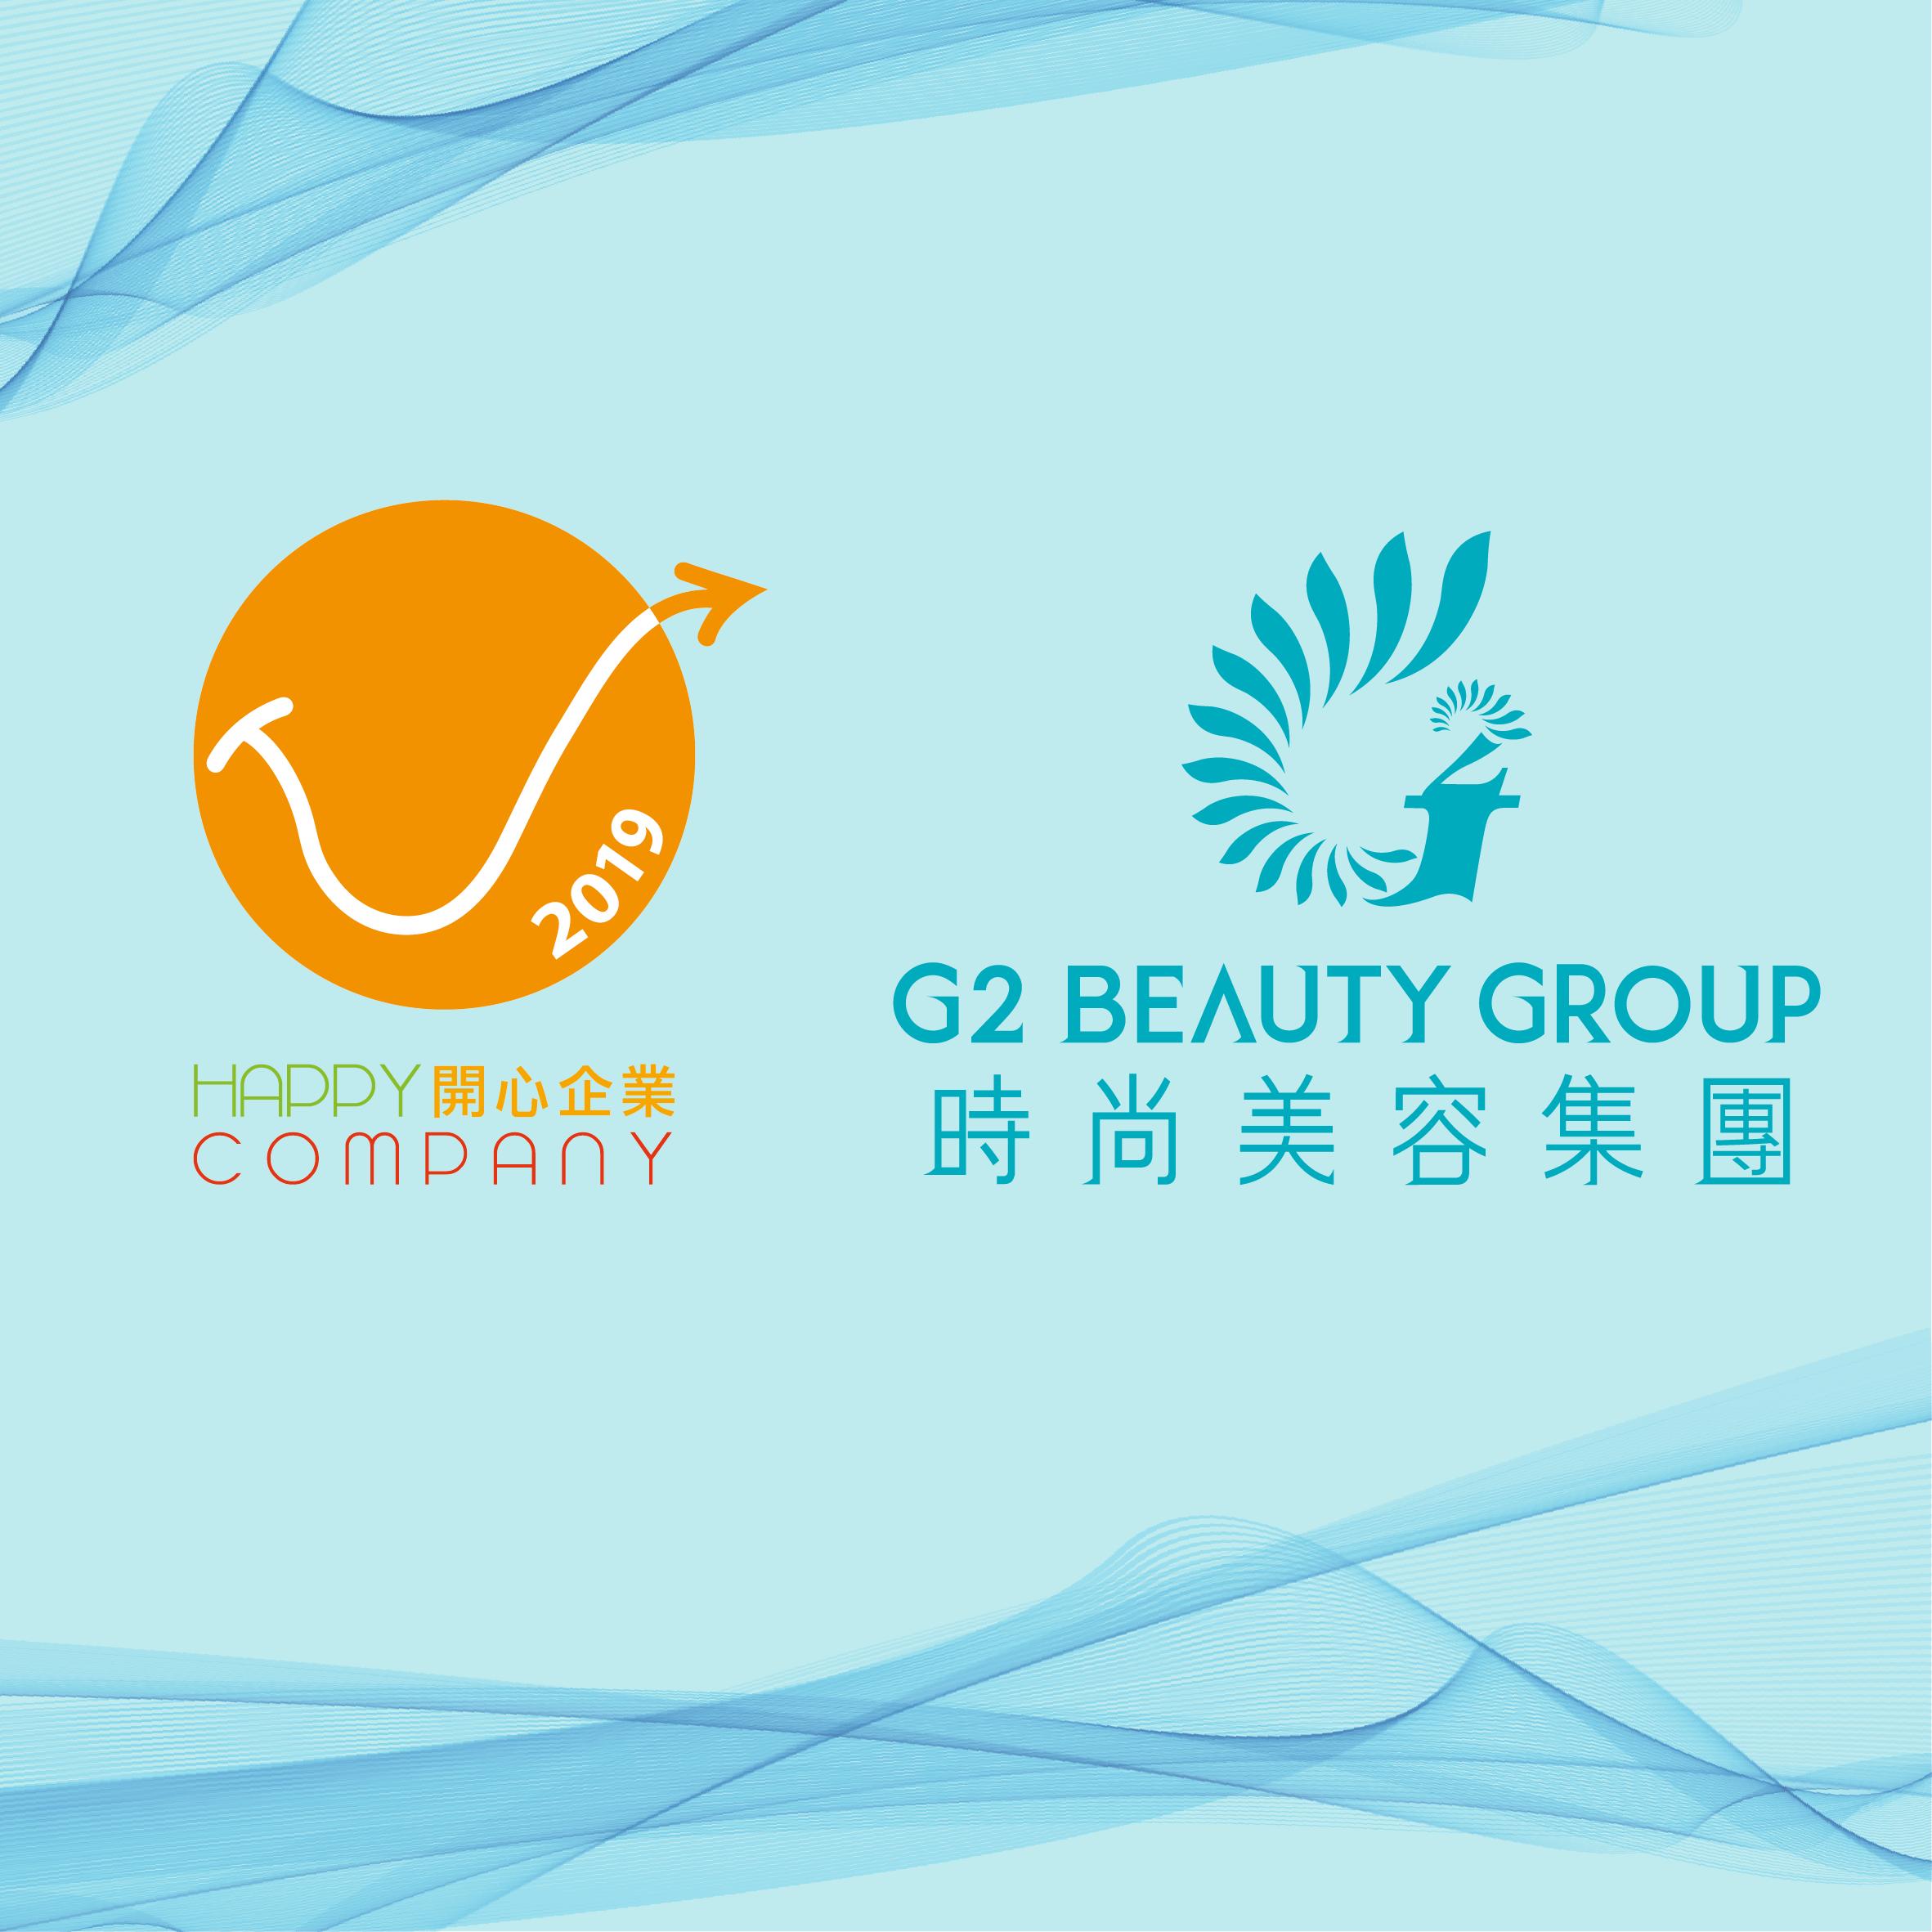 G2 Beauty Group 榮獲「開心企業」大獎